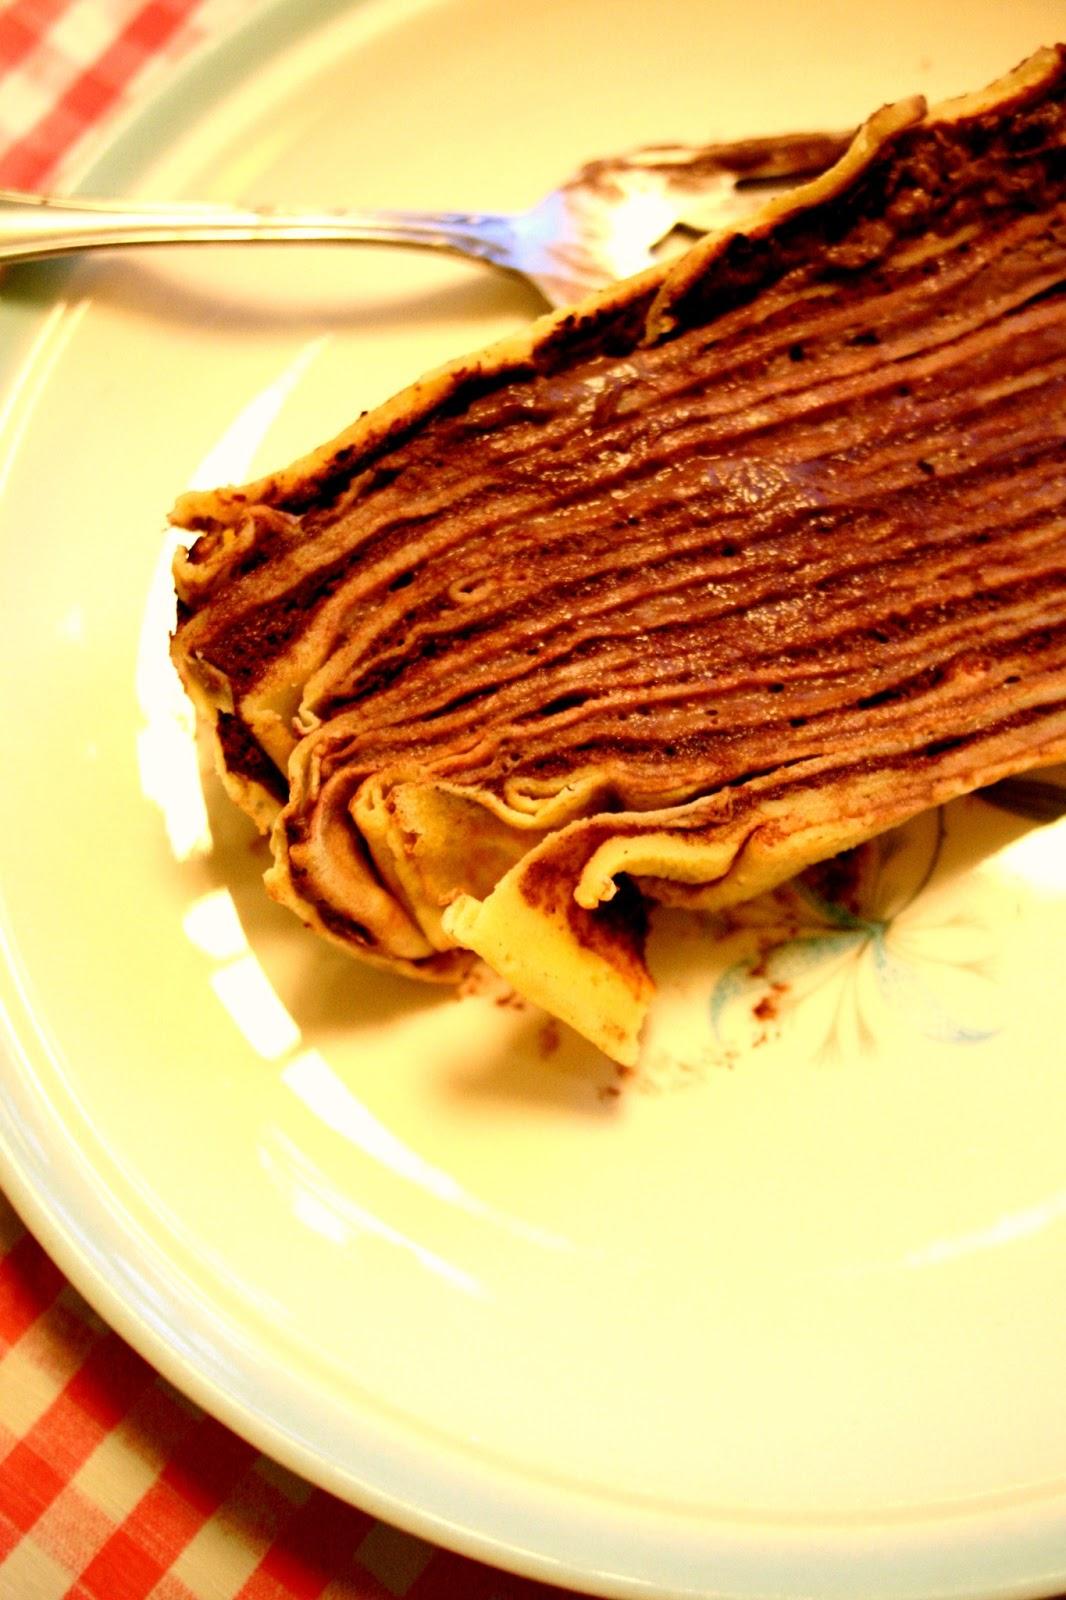 le gateau de crepe ala chocolat (or something like that)